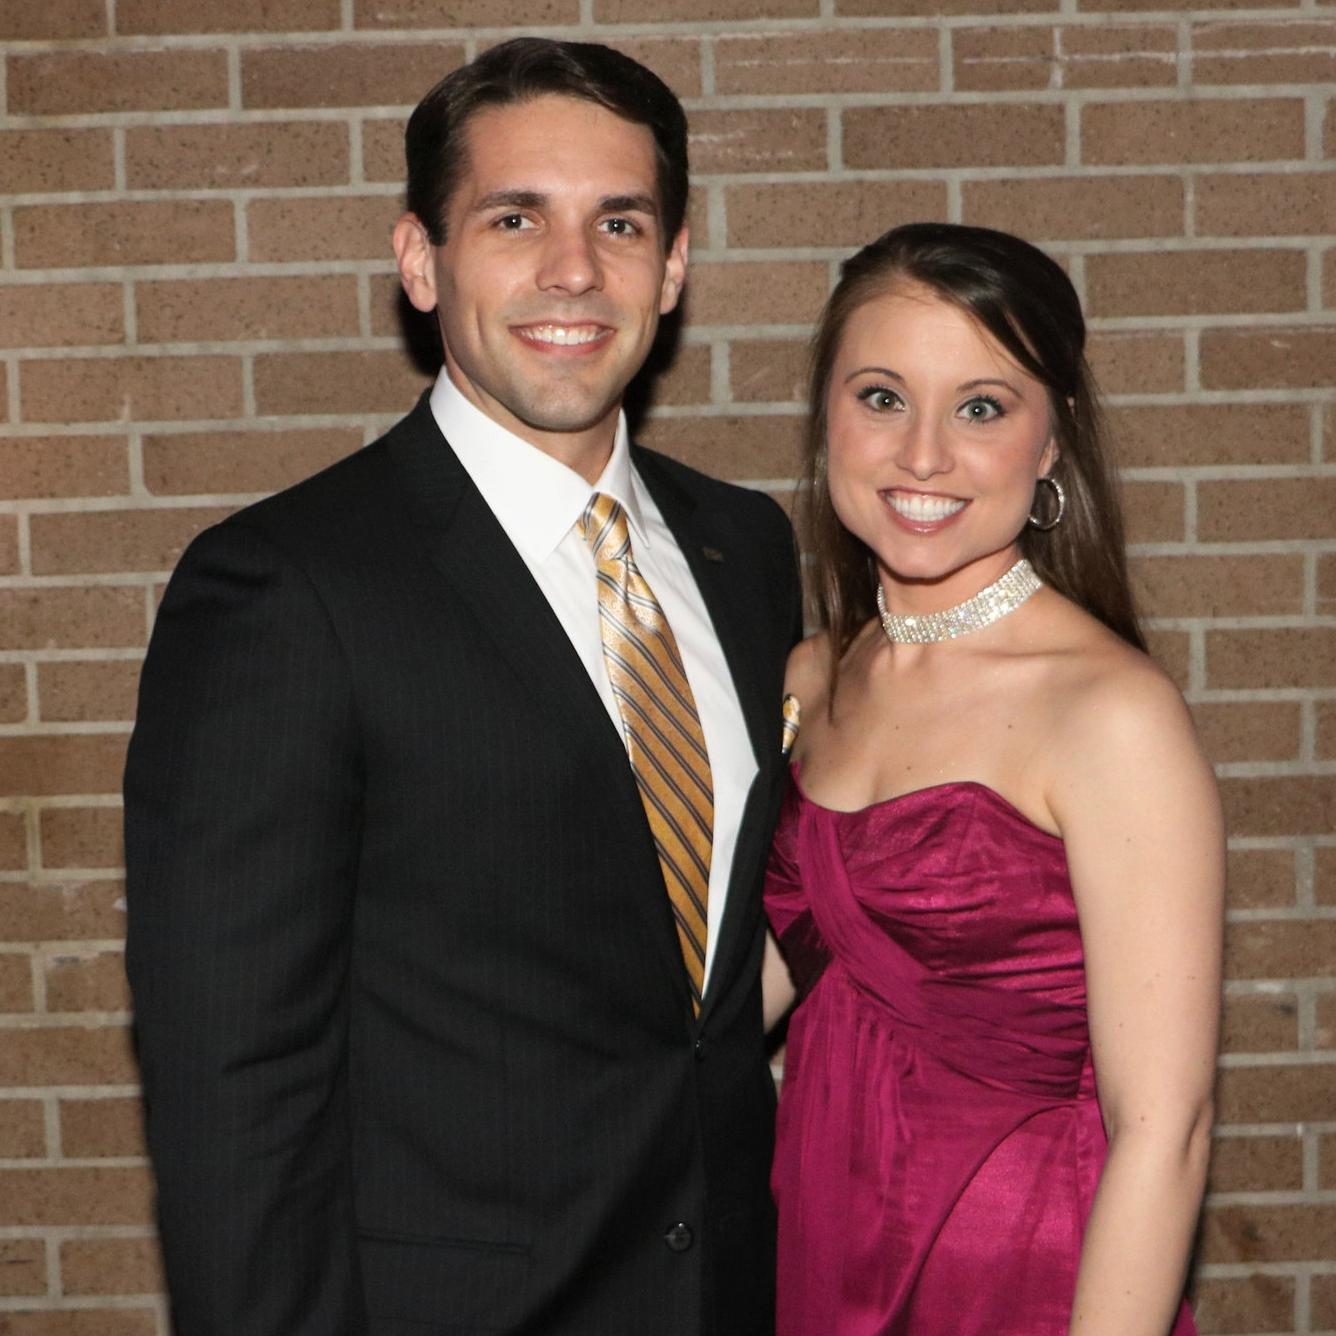 Scott & Nikki Conger